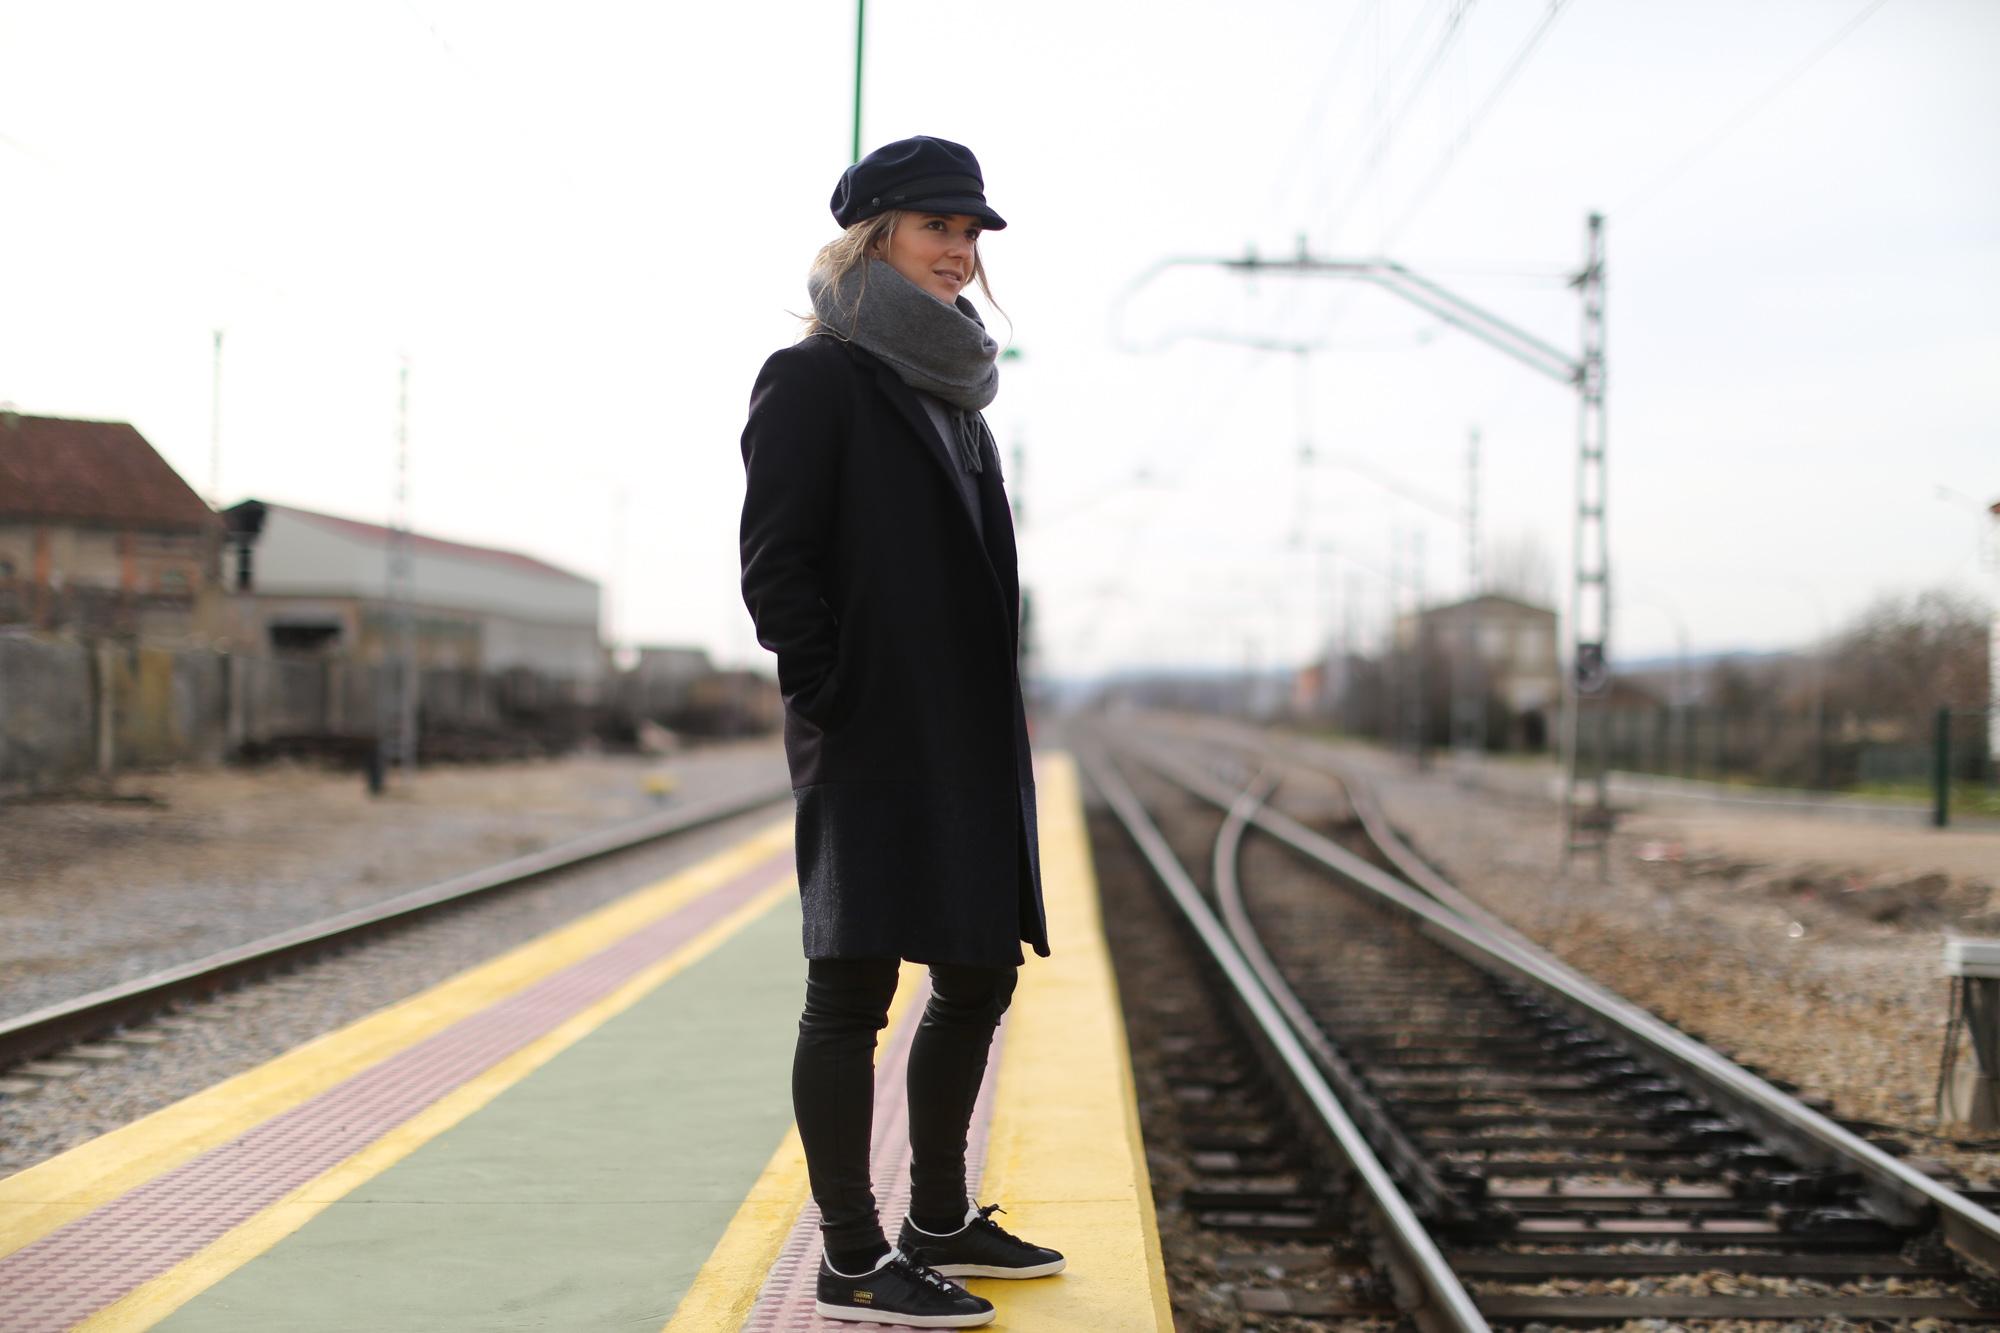 Clochet_streetstyle_cos_coat_saint_james_hat_adidas_gazelle-1-2